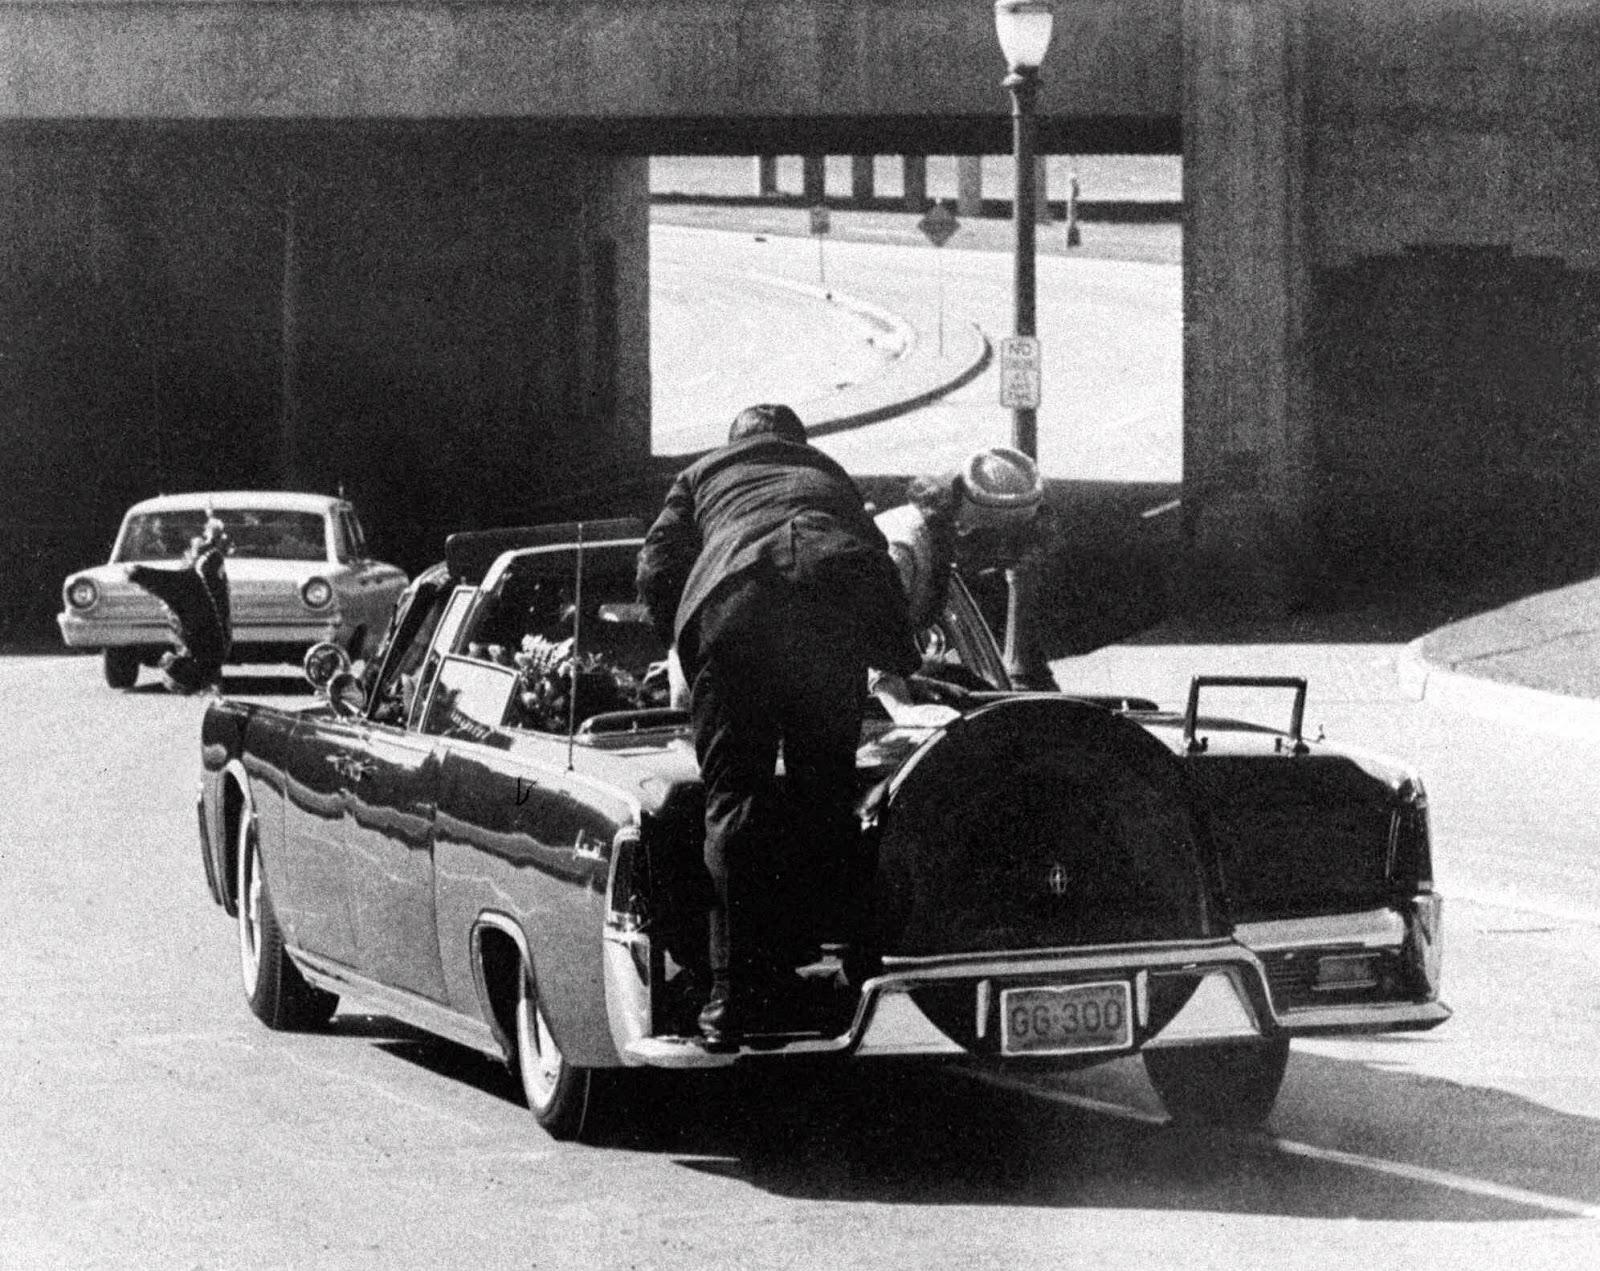 Coche tras el asesinato de JFK